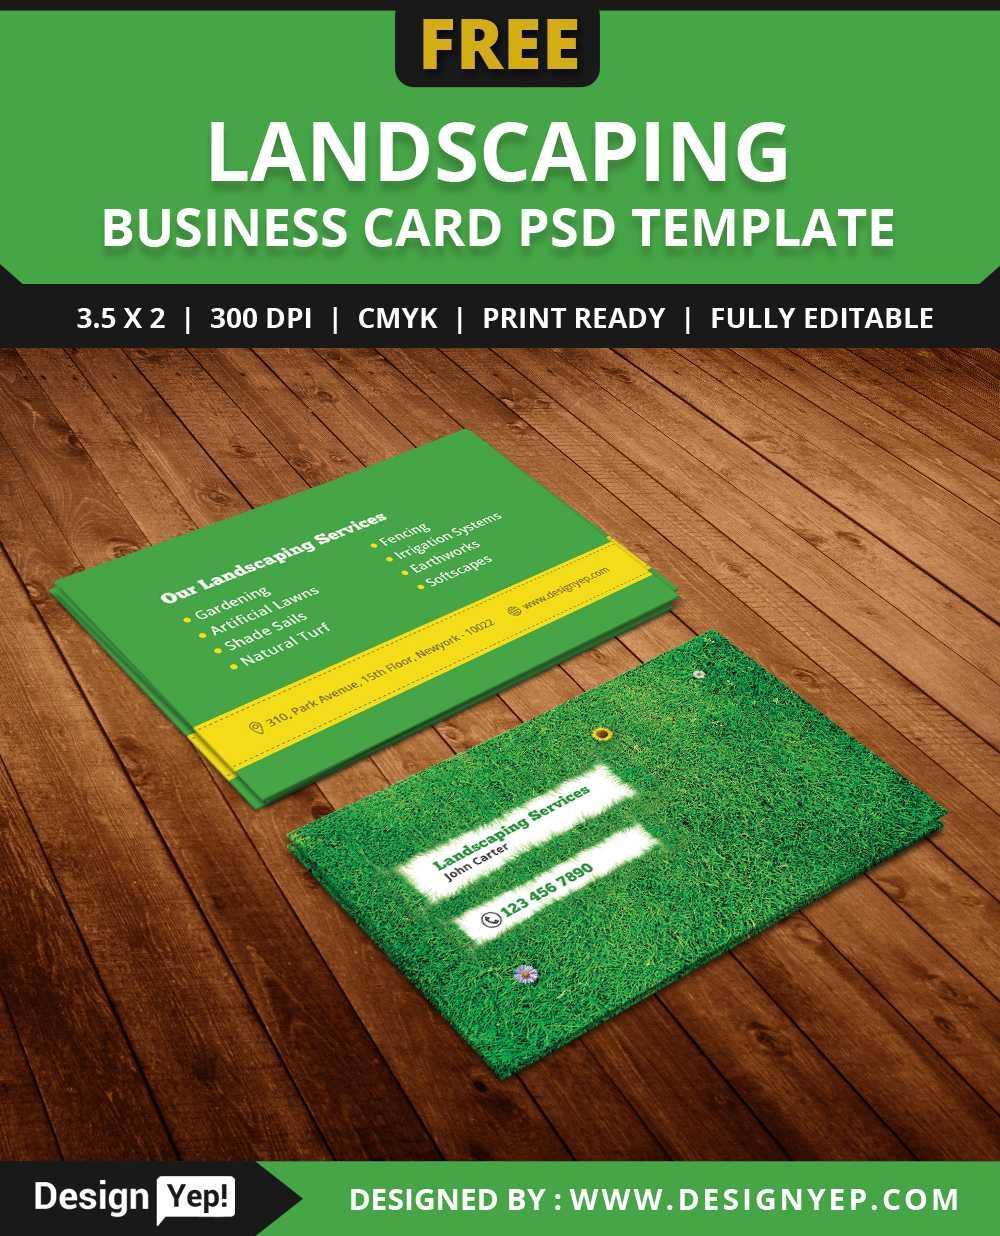 Free Landscaping Business Card Template Psd – Designyep Regarding Gardening Business Cards Templates